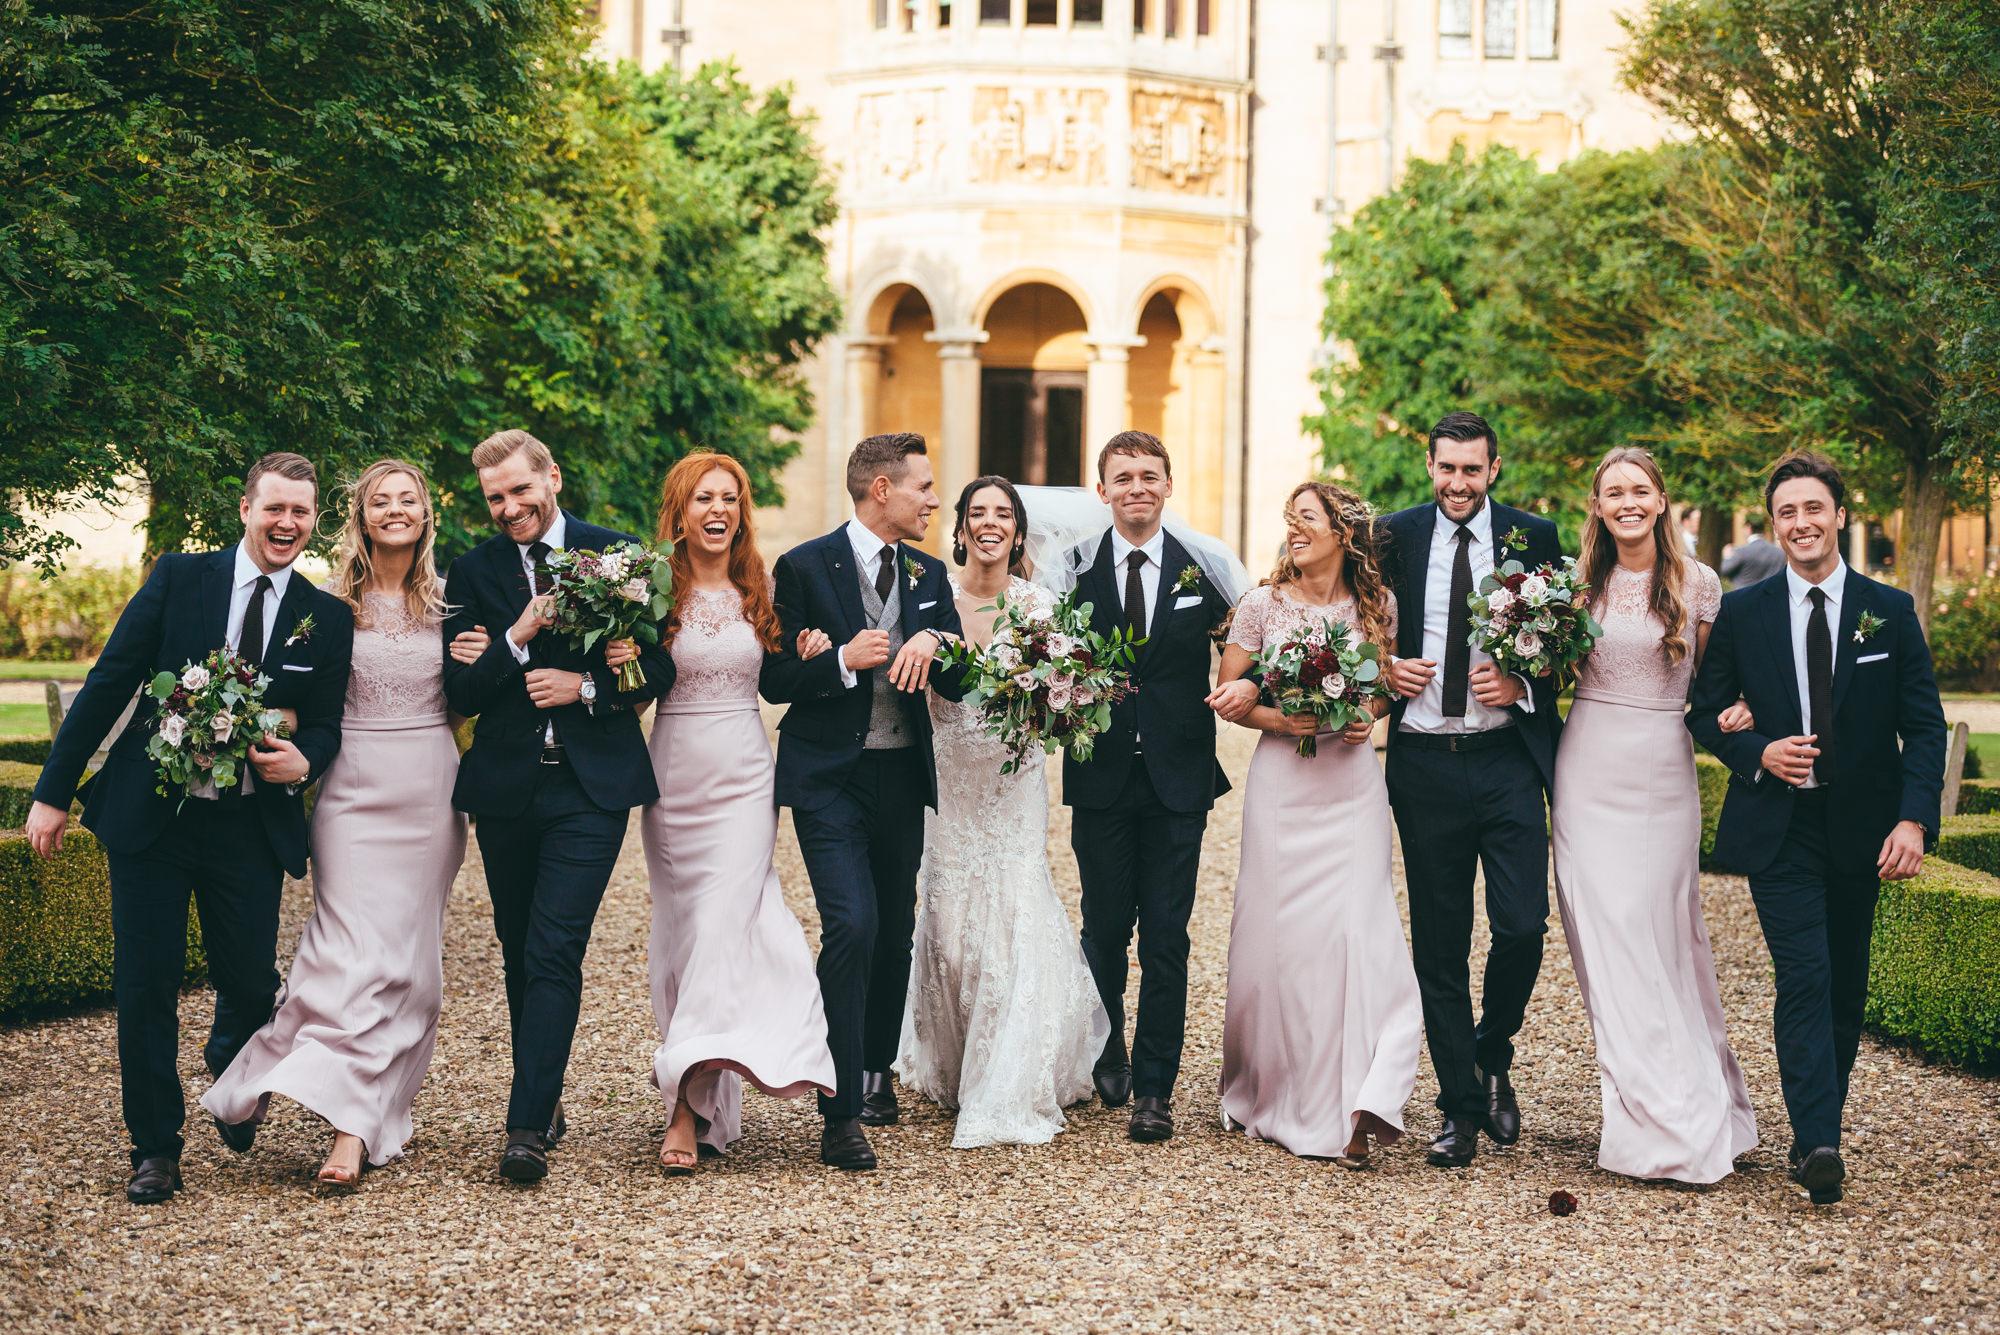 bridal party walking together laughing at harlaxton manor